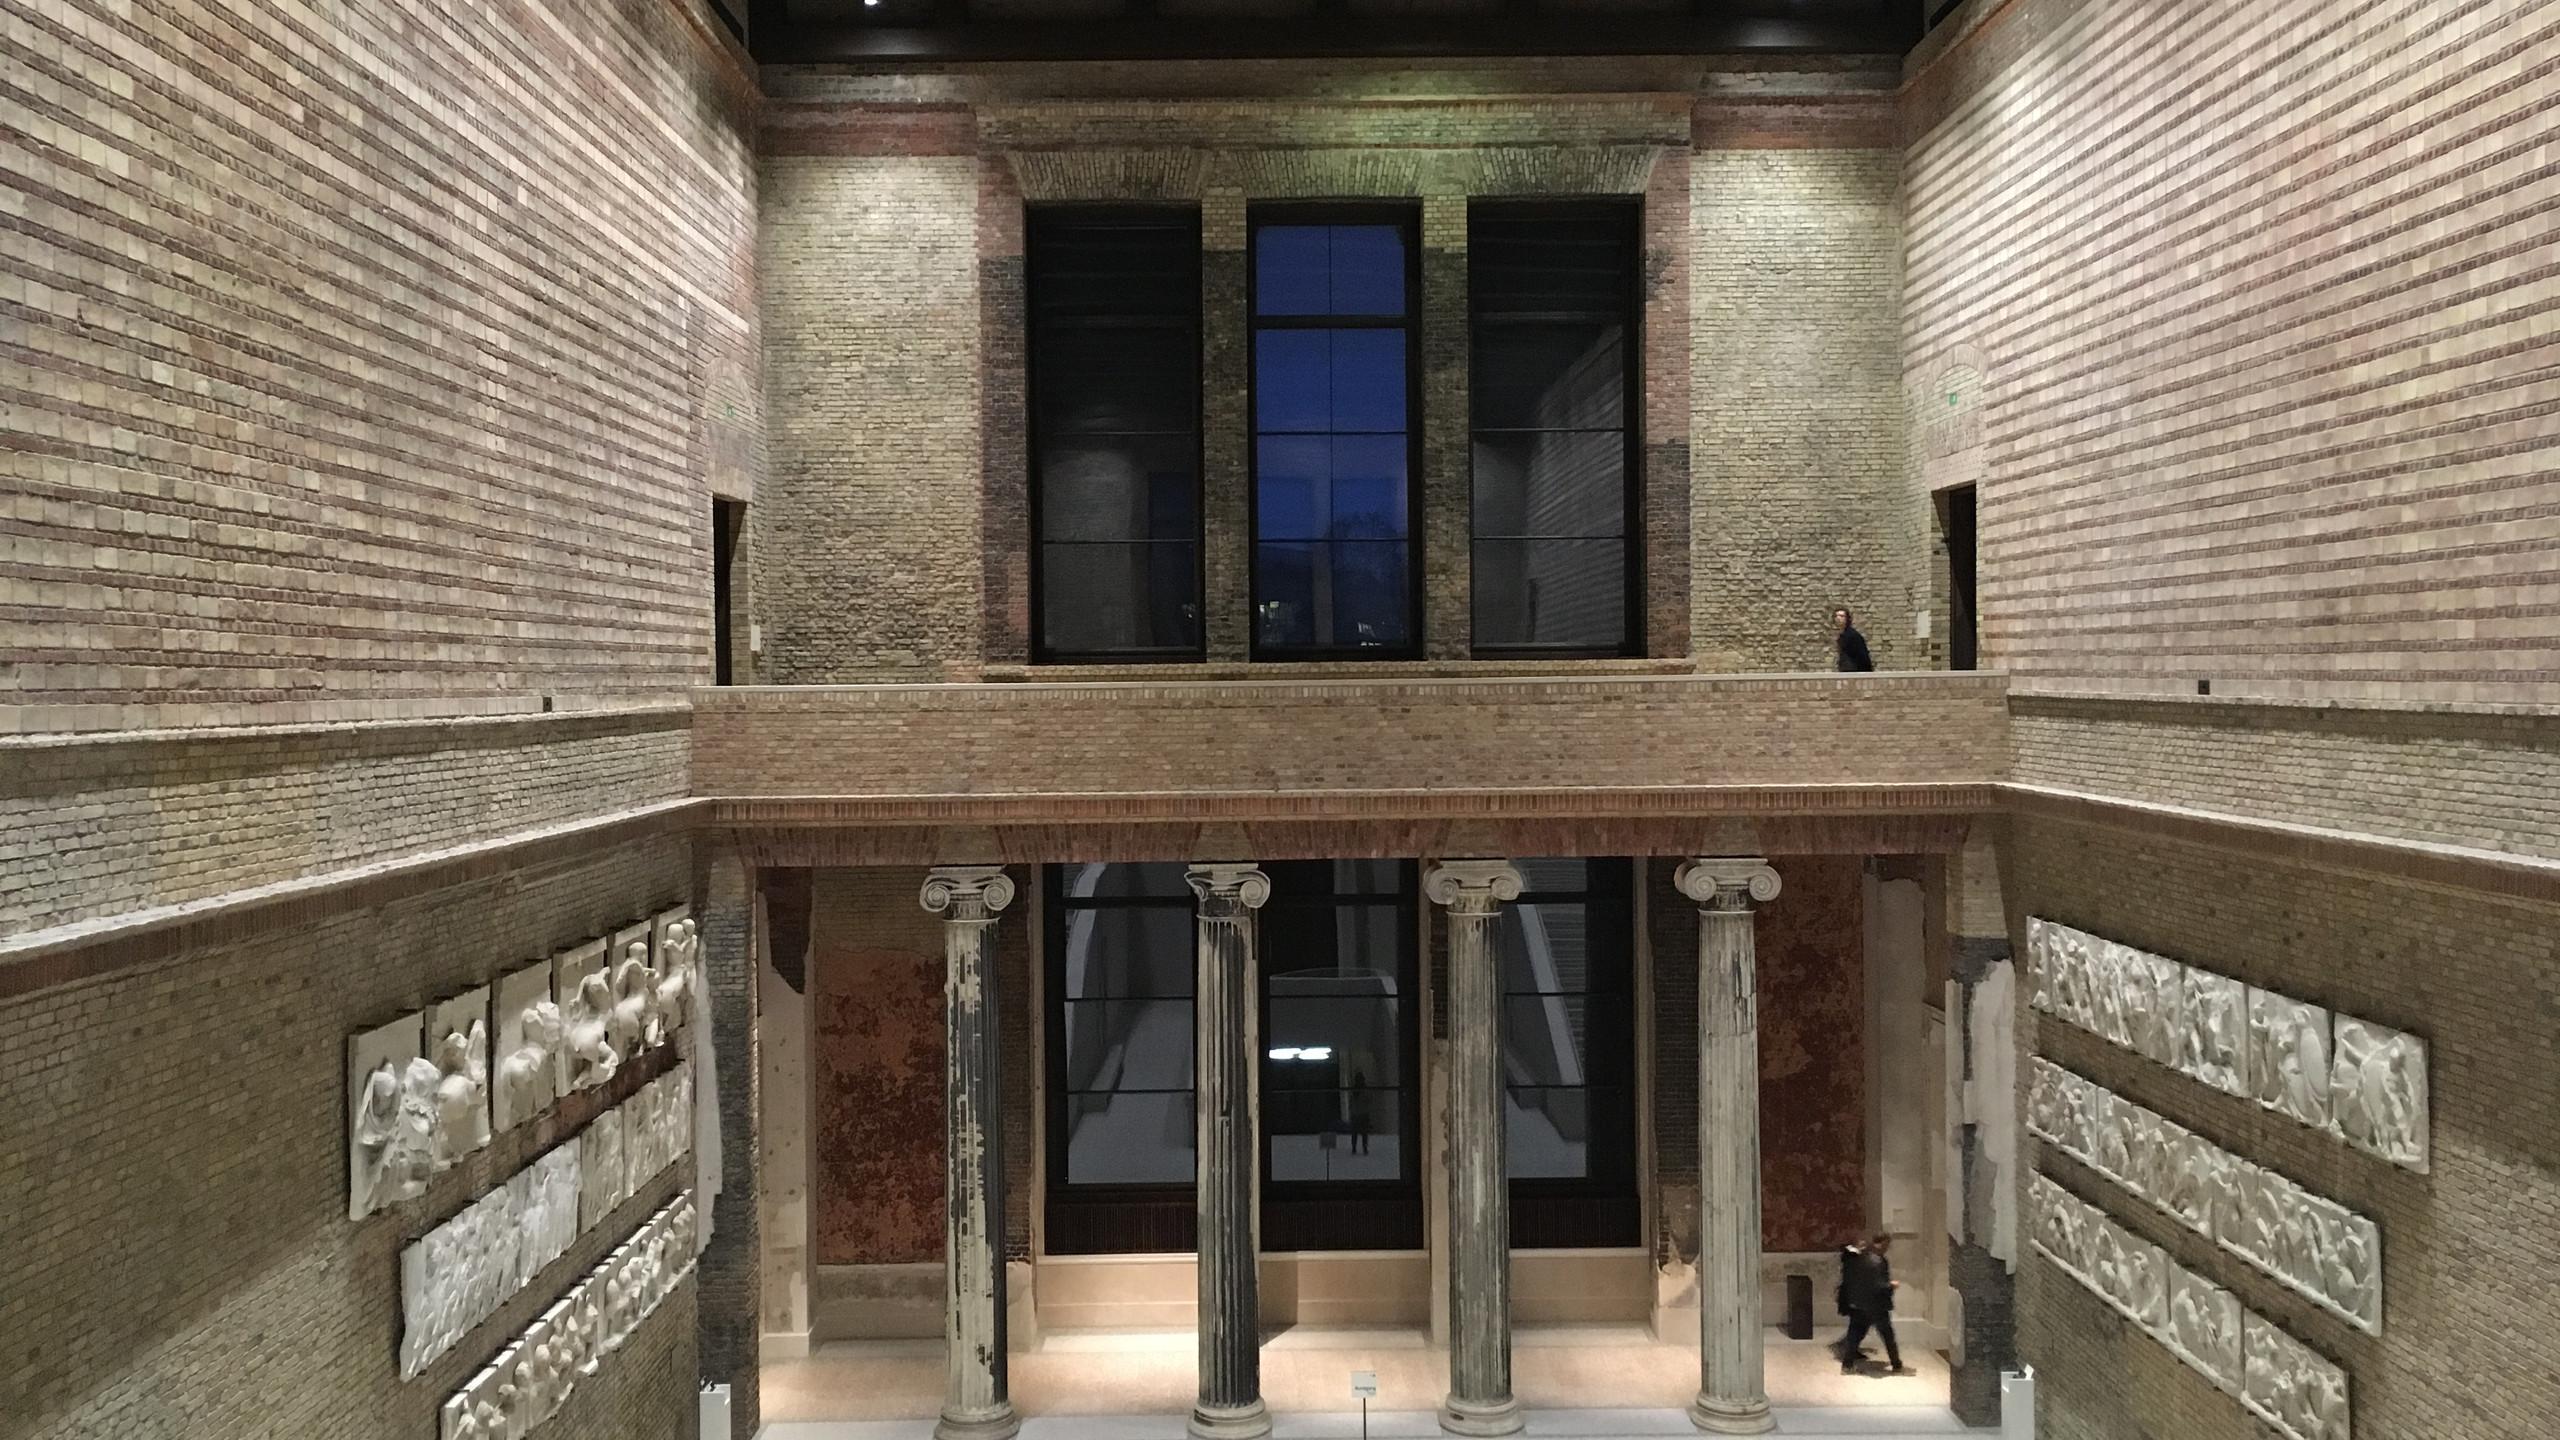 inside Neues Museum